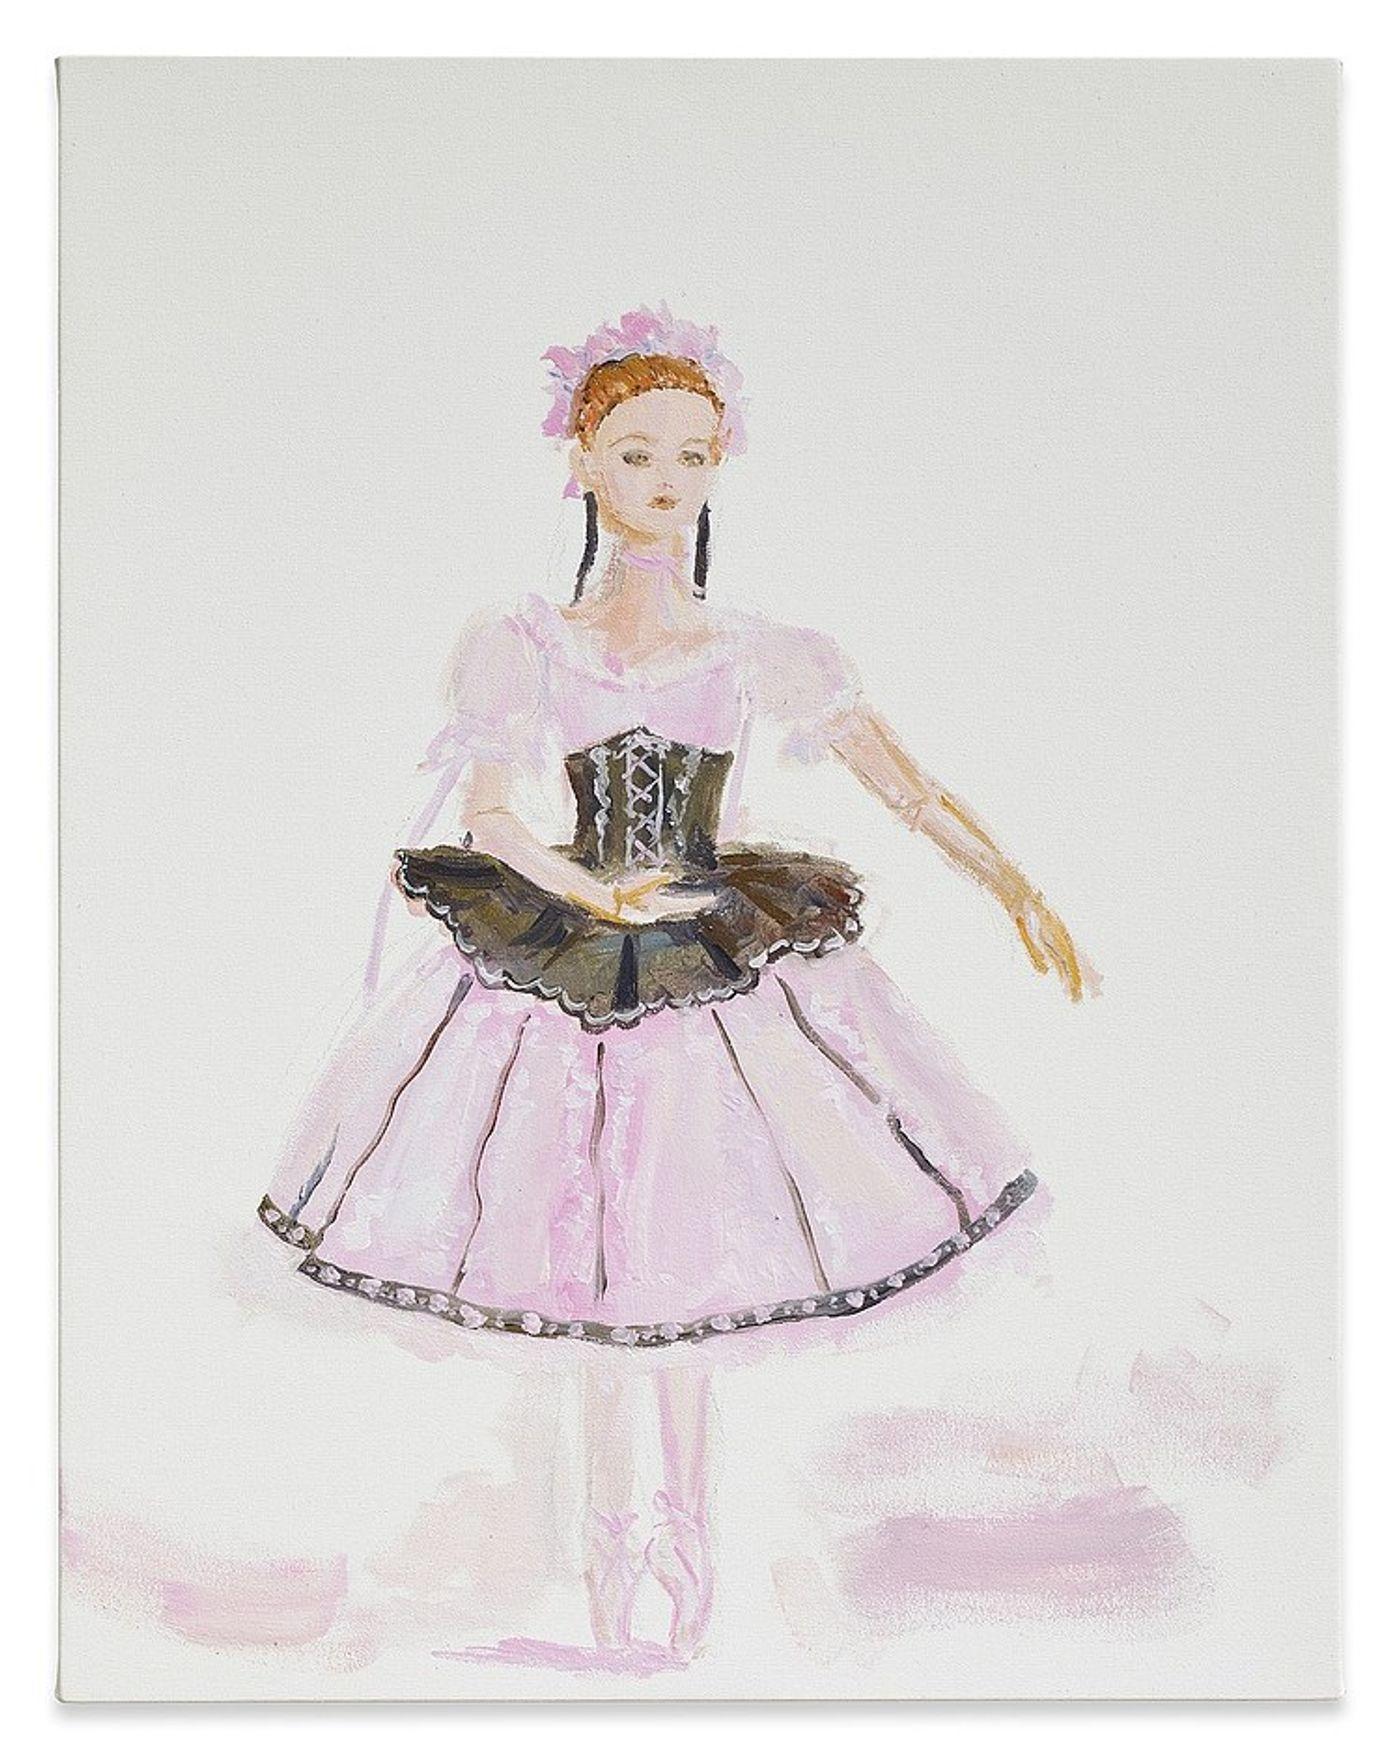 Karen Kilimnik, Silesian princess ballerina, 2018. Water soluble oil color on canvas, 20 × 16 in (50.8 × 40.6 cm).